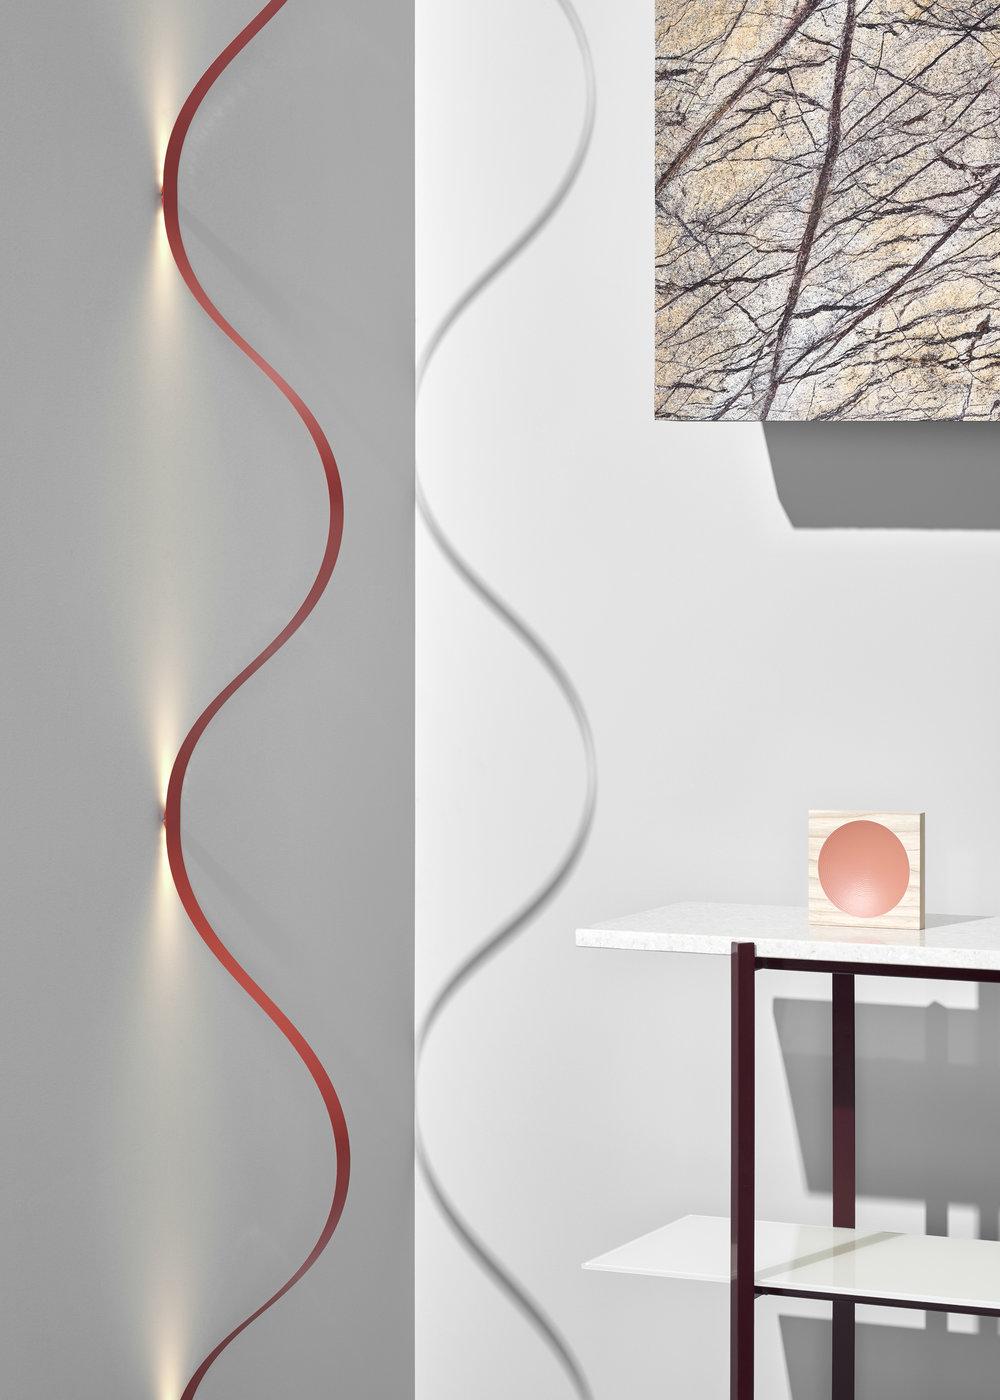 Milan_2019_A-David_Derksen_Design-Photography_Pim_ Top.jpg